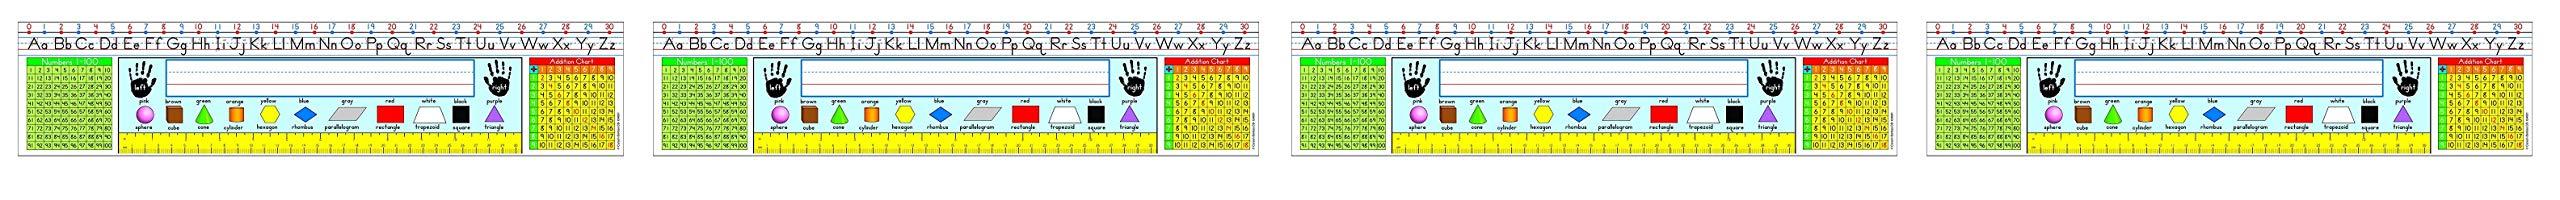 Carson Dellosa Traditional Manuscript: Grades 1-3 Nameplates (124001) (Fоur Расk)